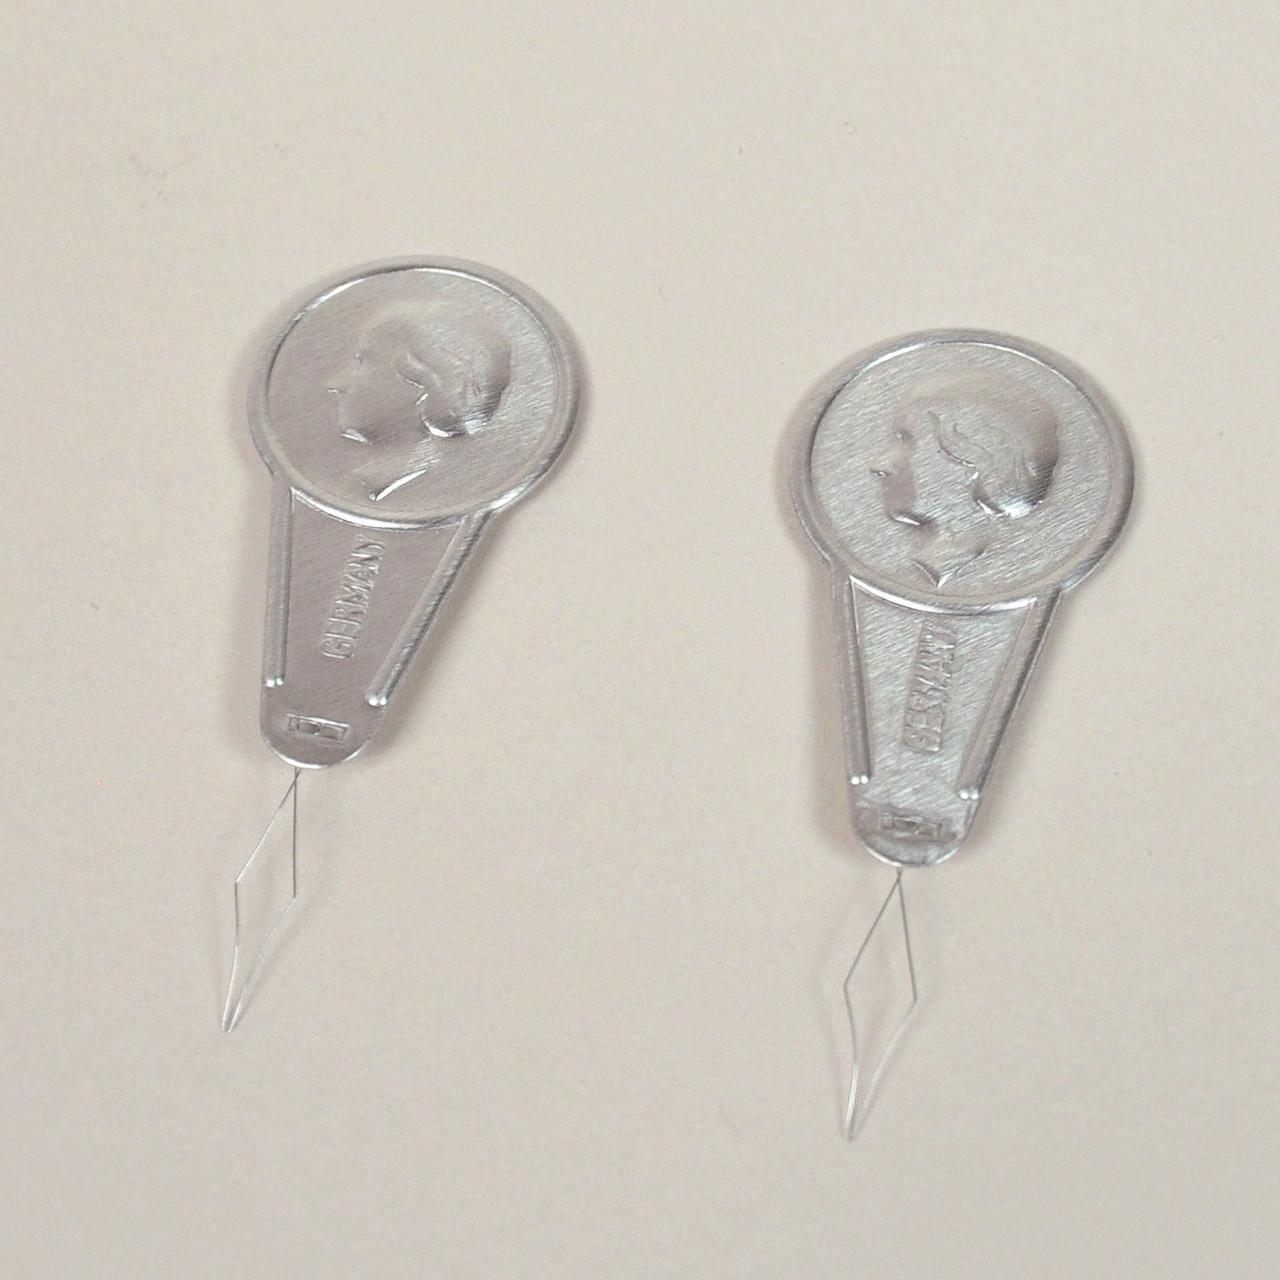 New Needle Threader 2-pack Other Art Supplies